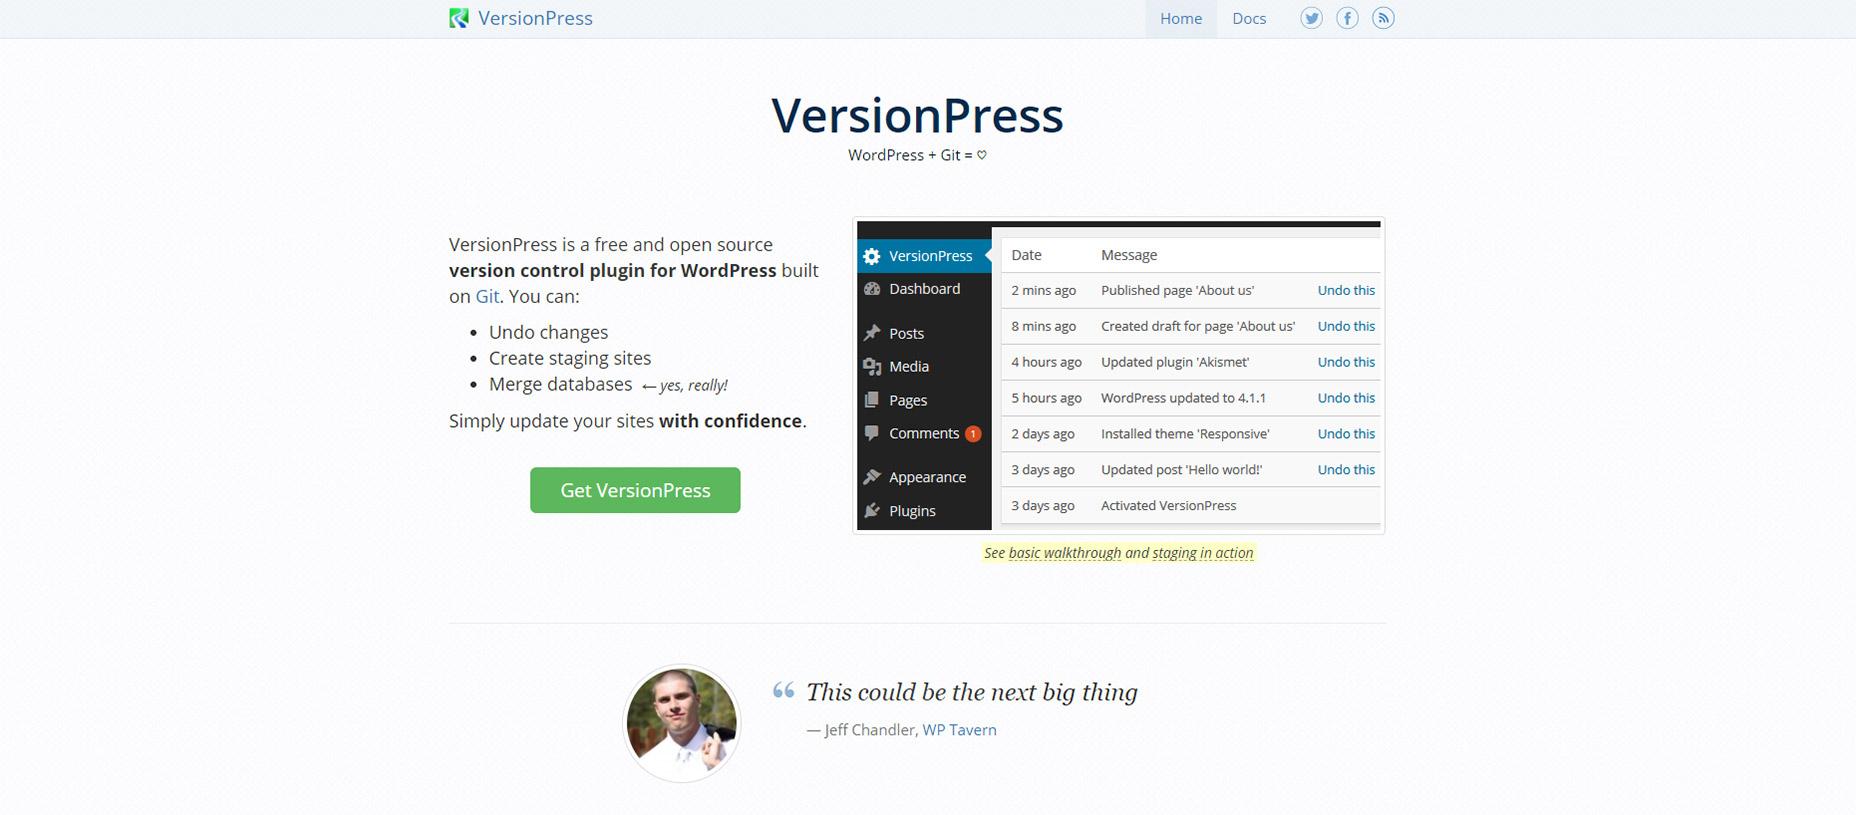 05-version-press-plugin-homepage